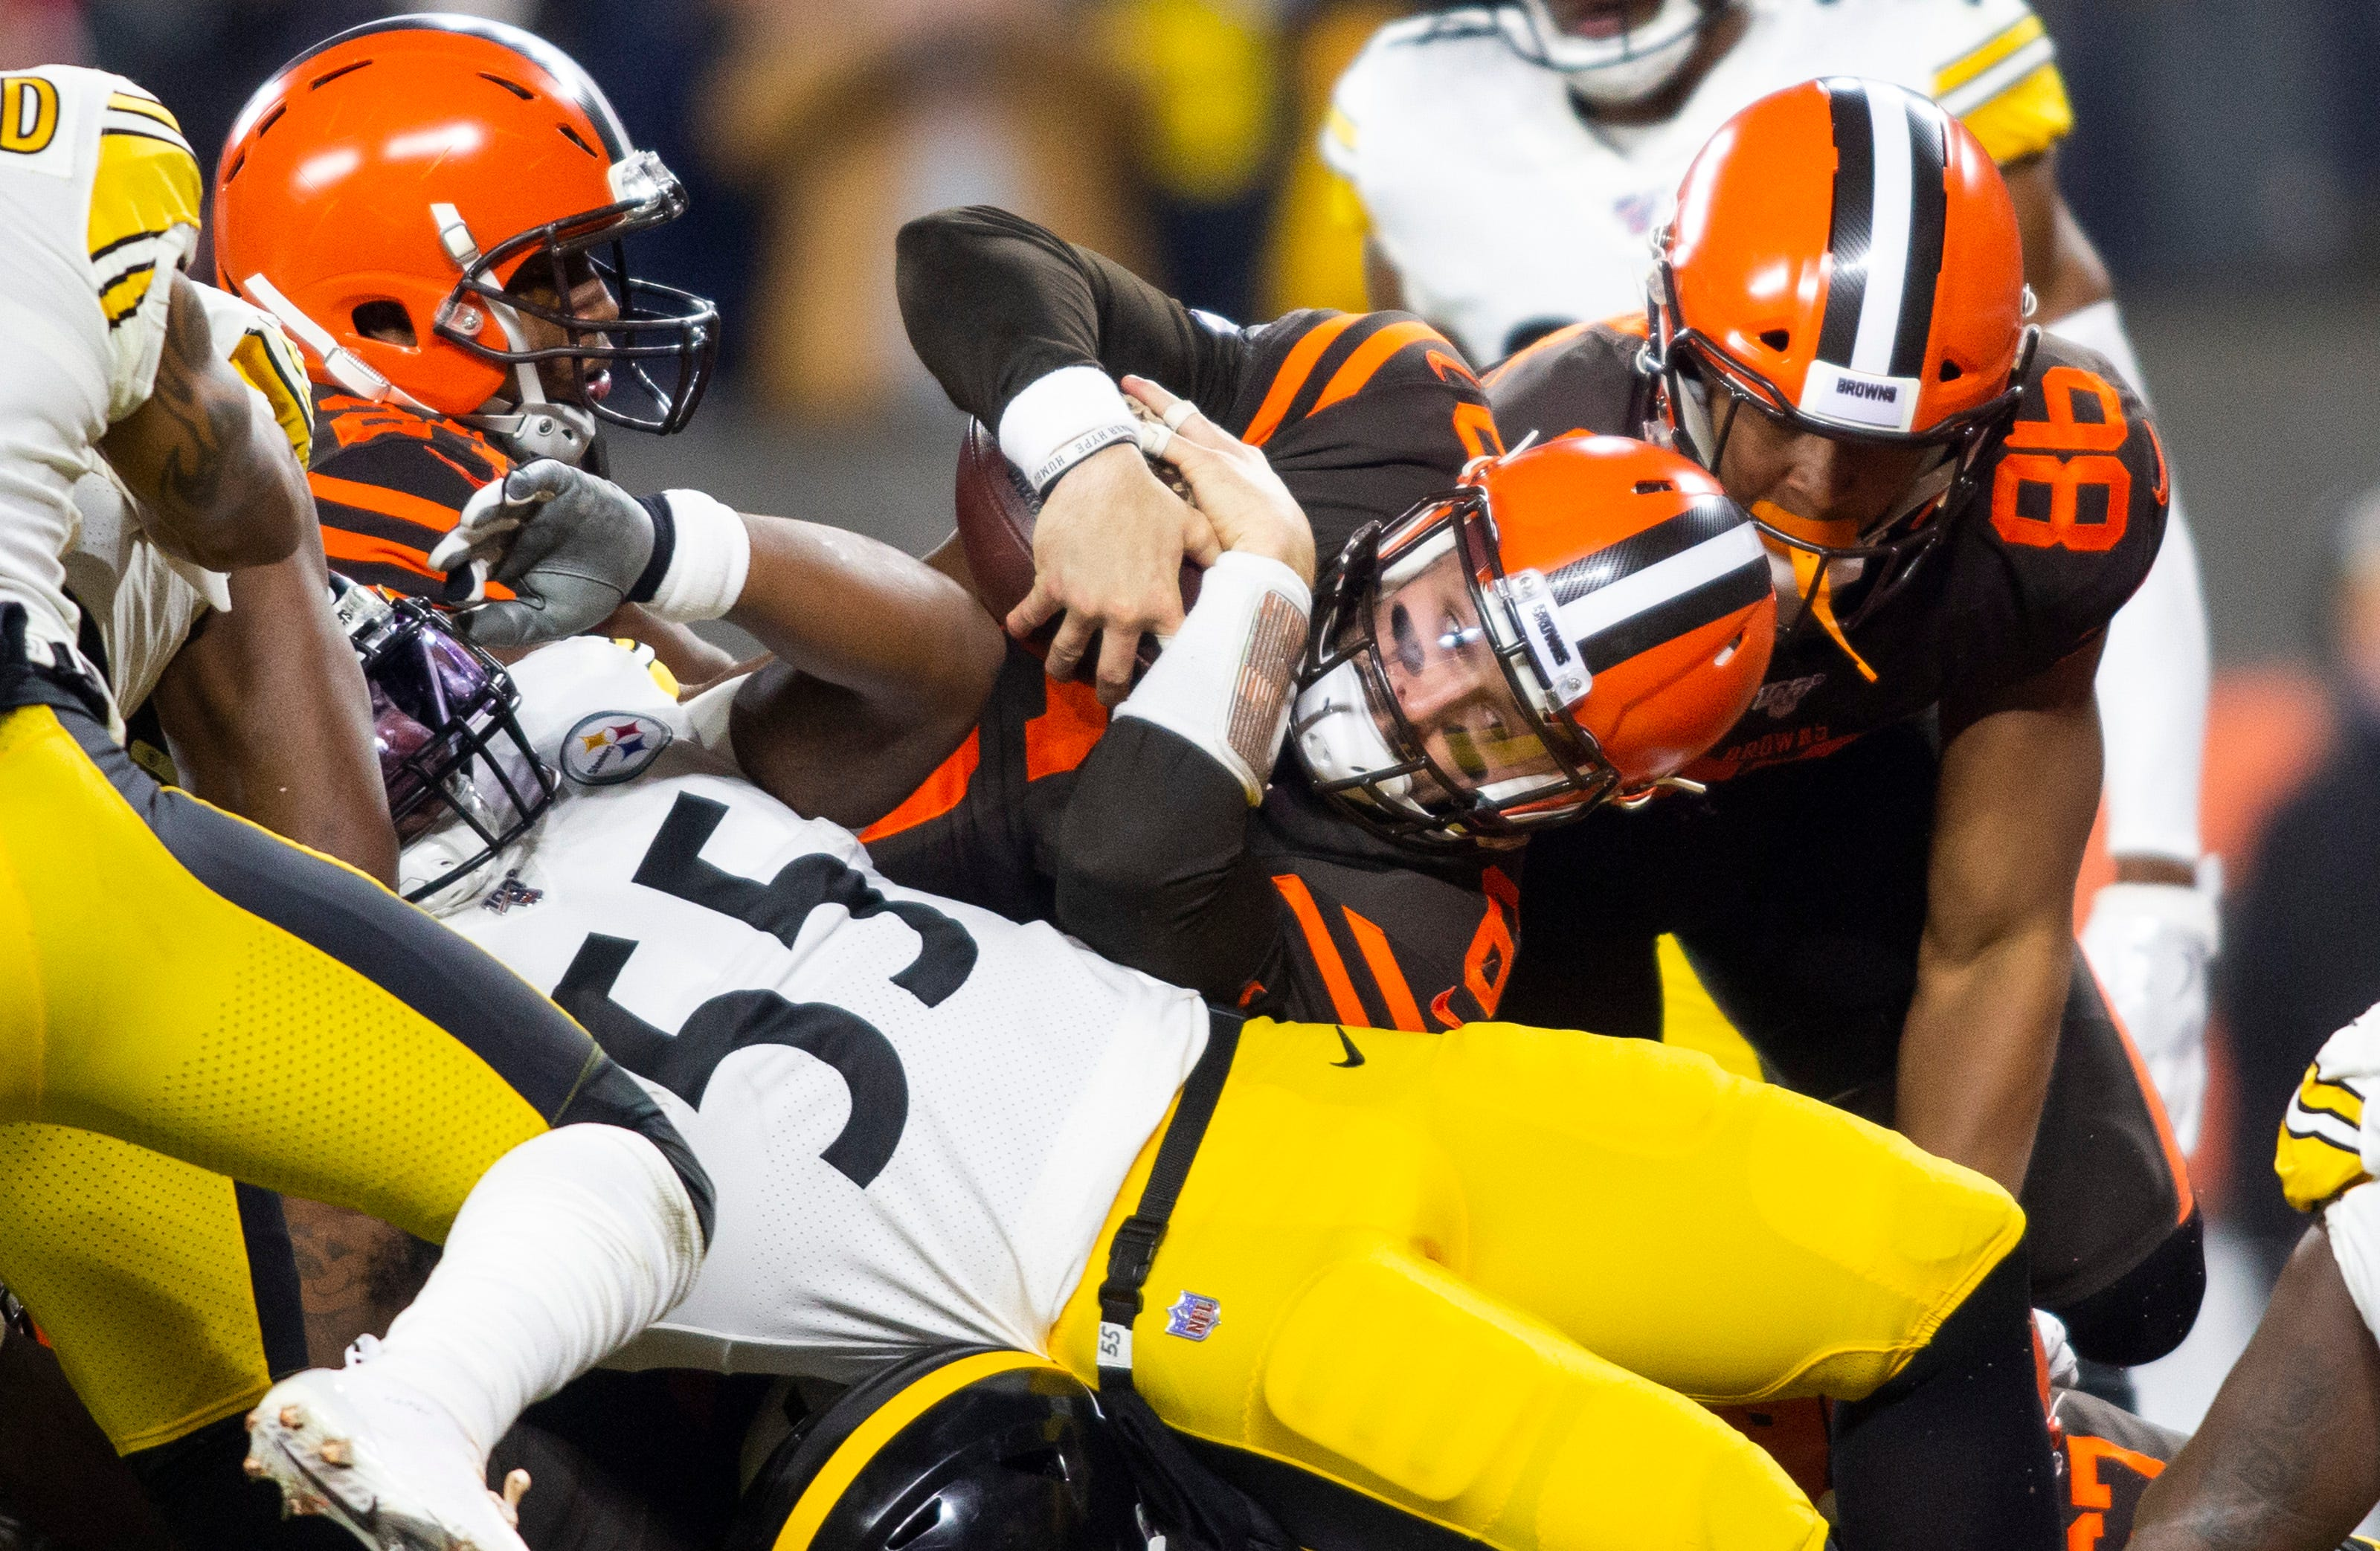 NFL Week 11's best photos